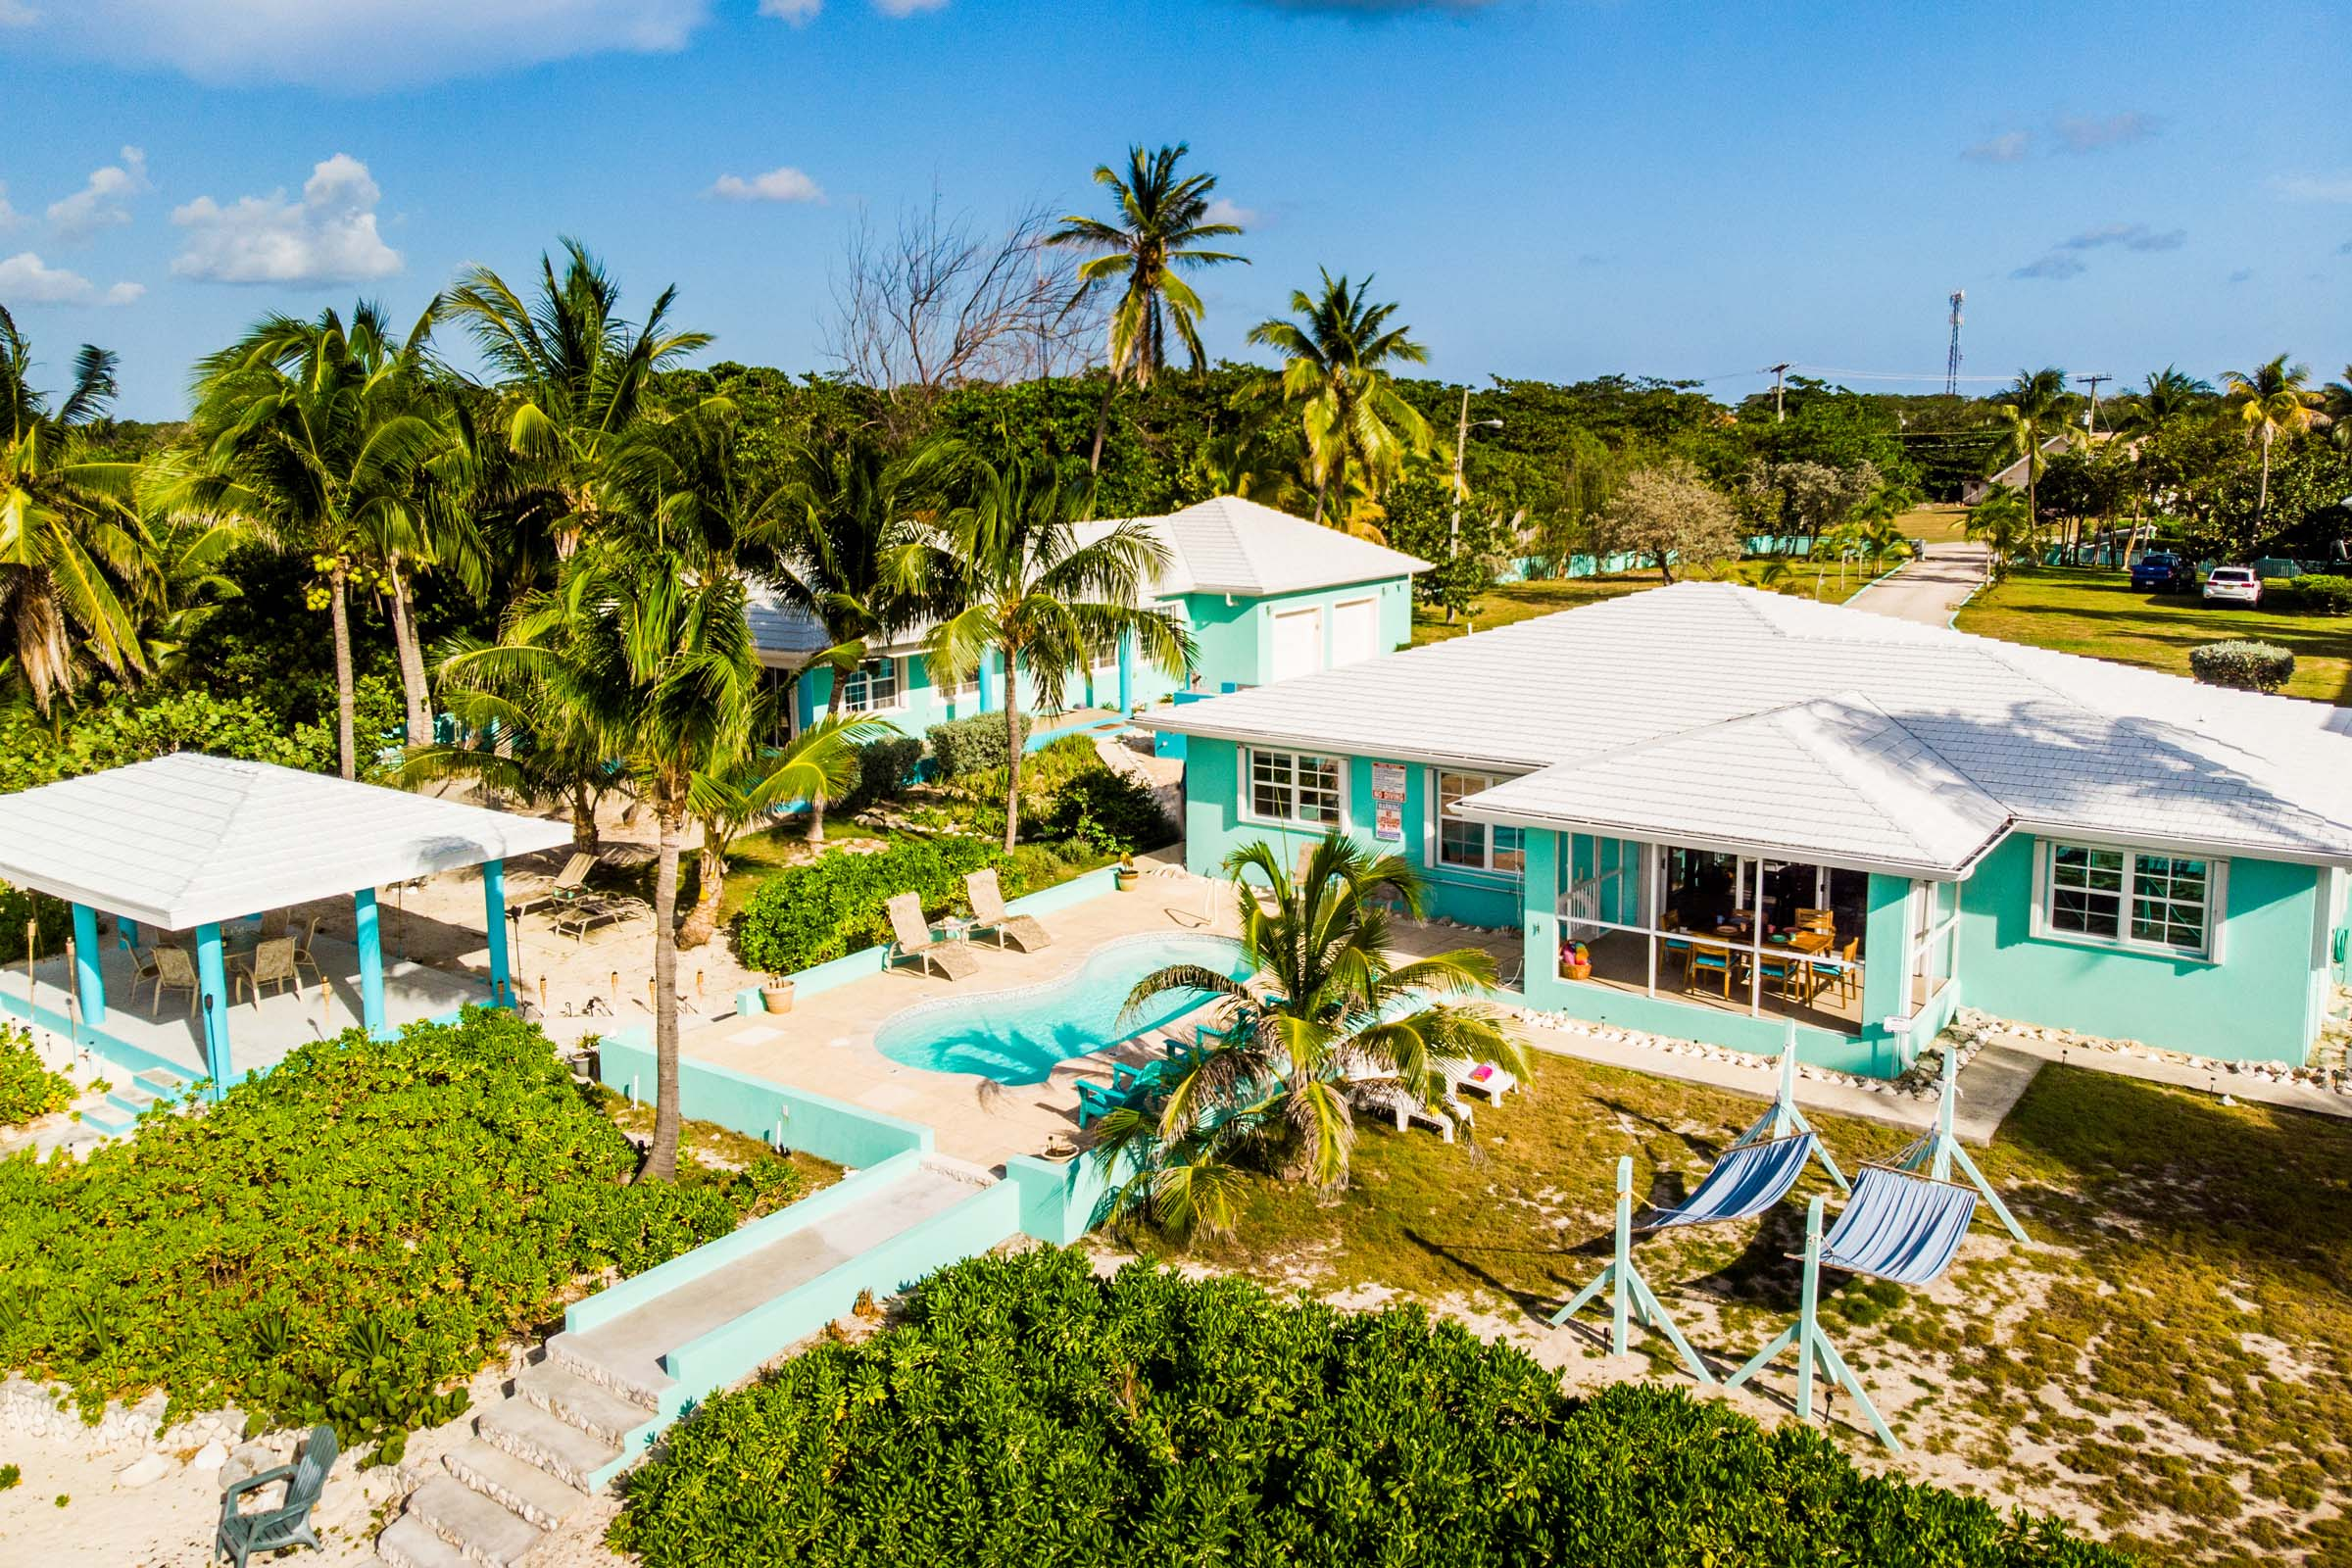 Blue Vista Villa Aerial Photos